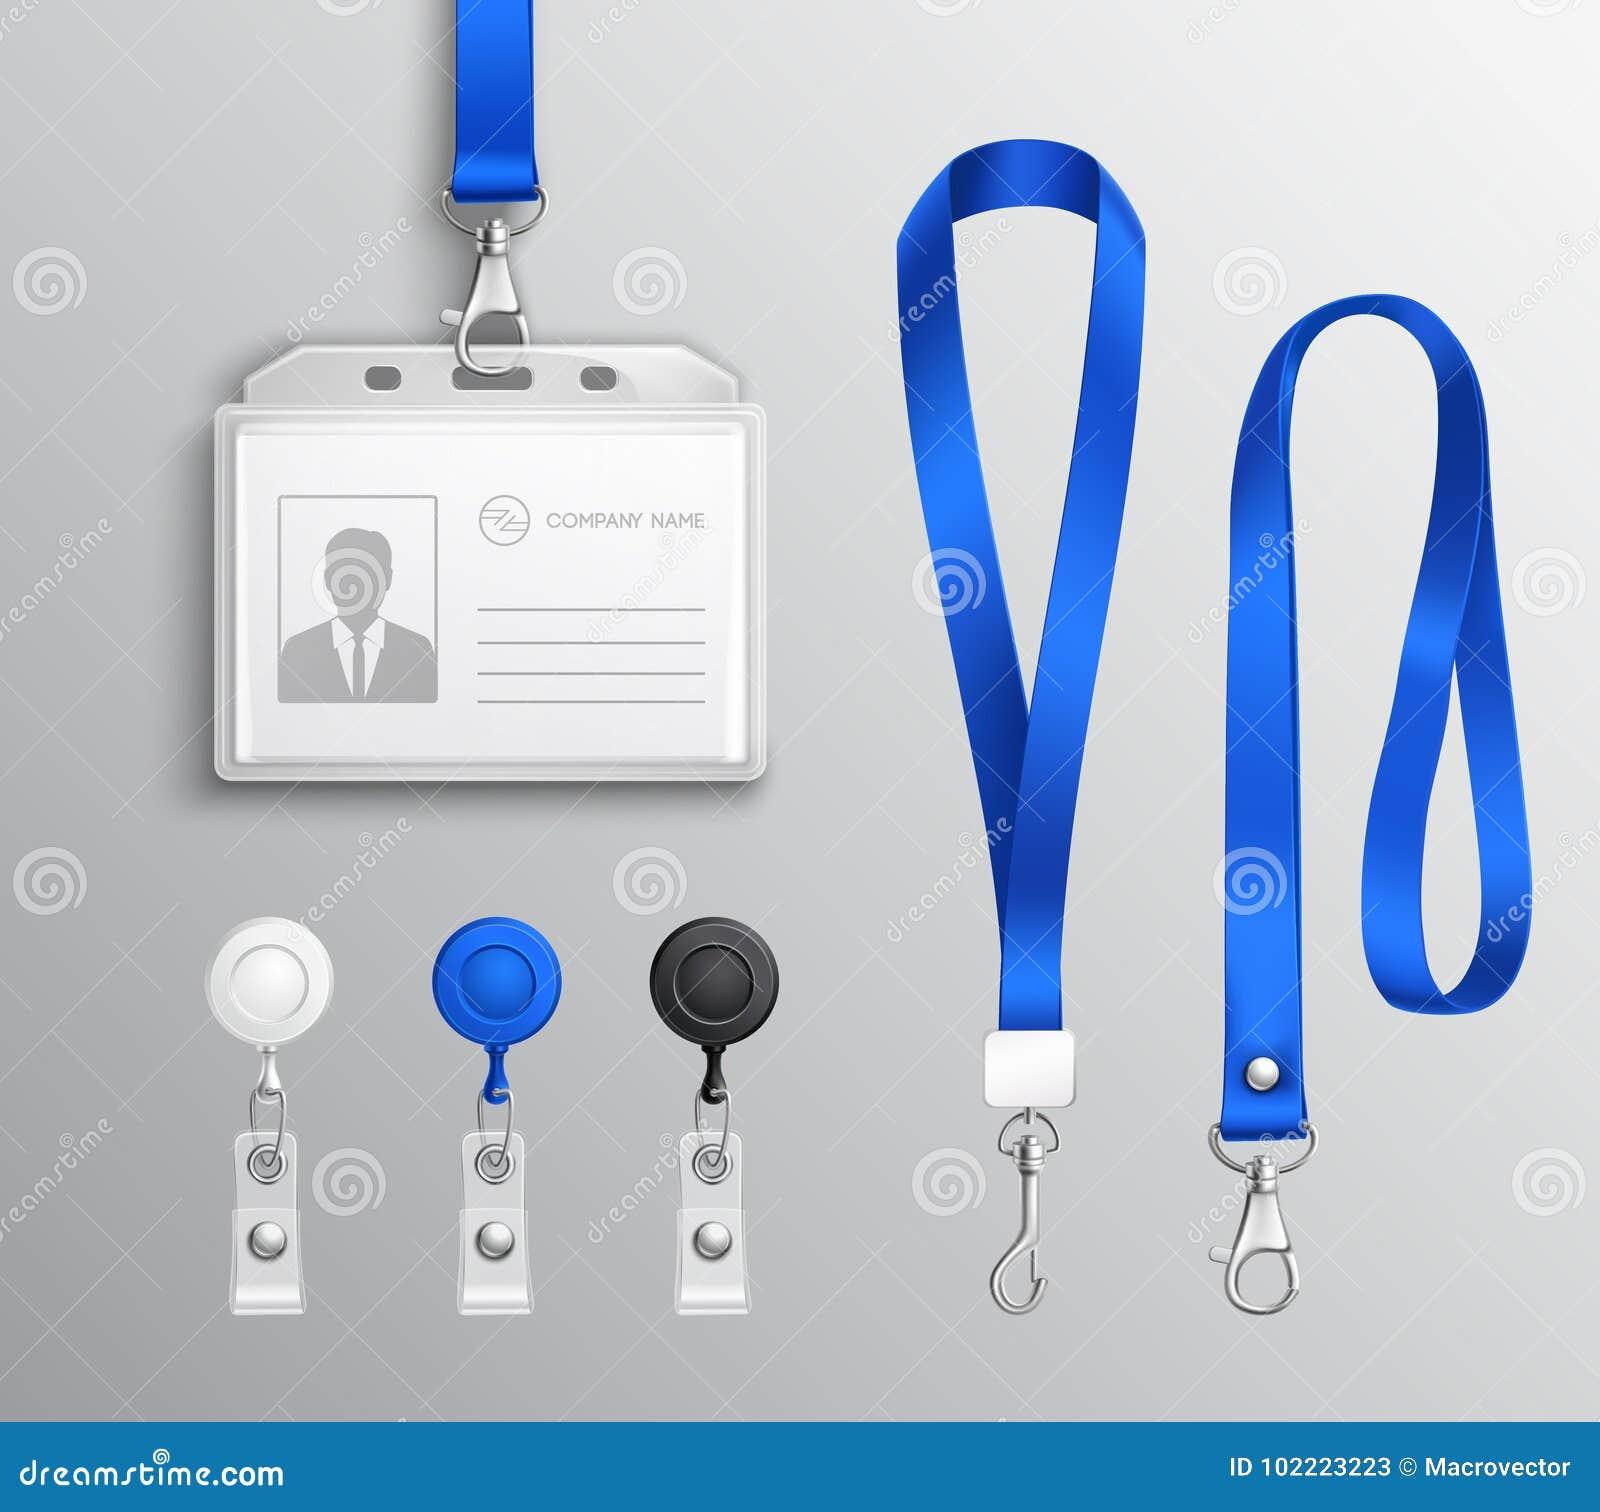 Identification Card Badge Accessories Set Stock Vector ...